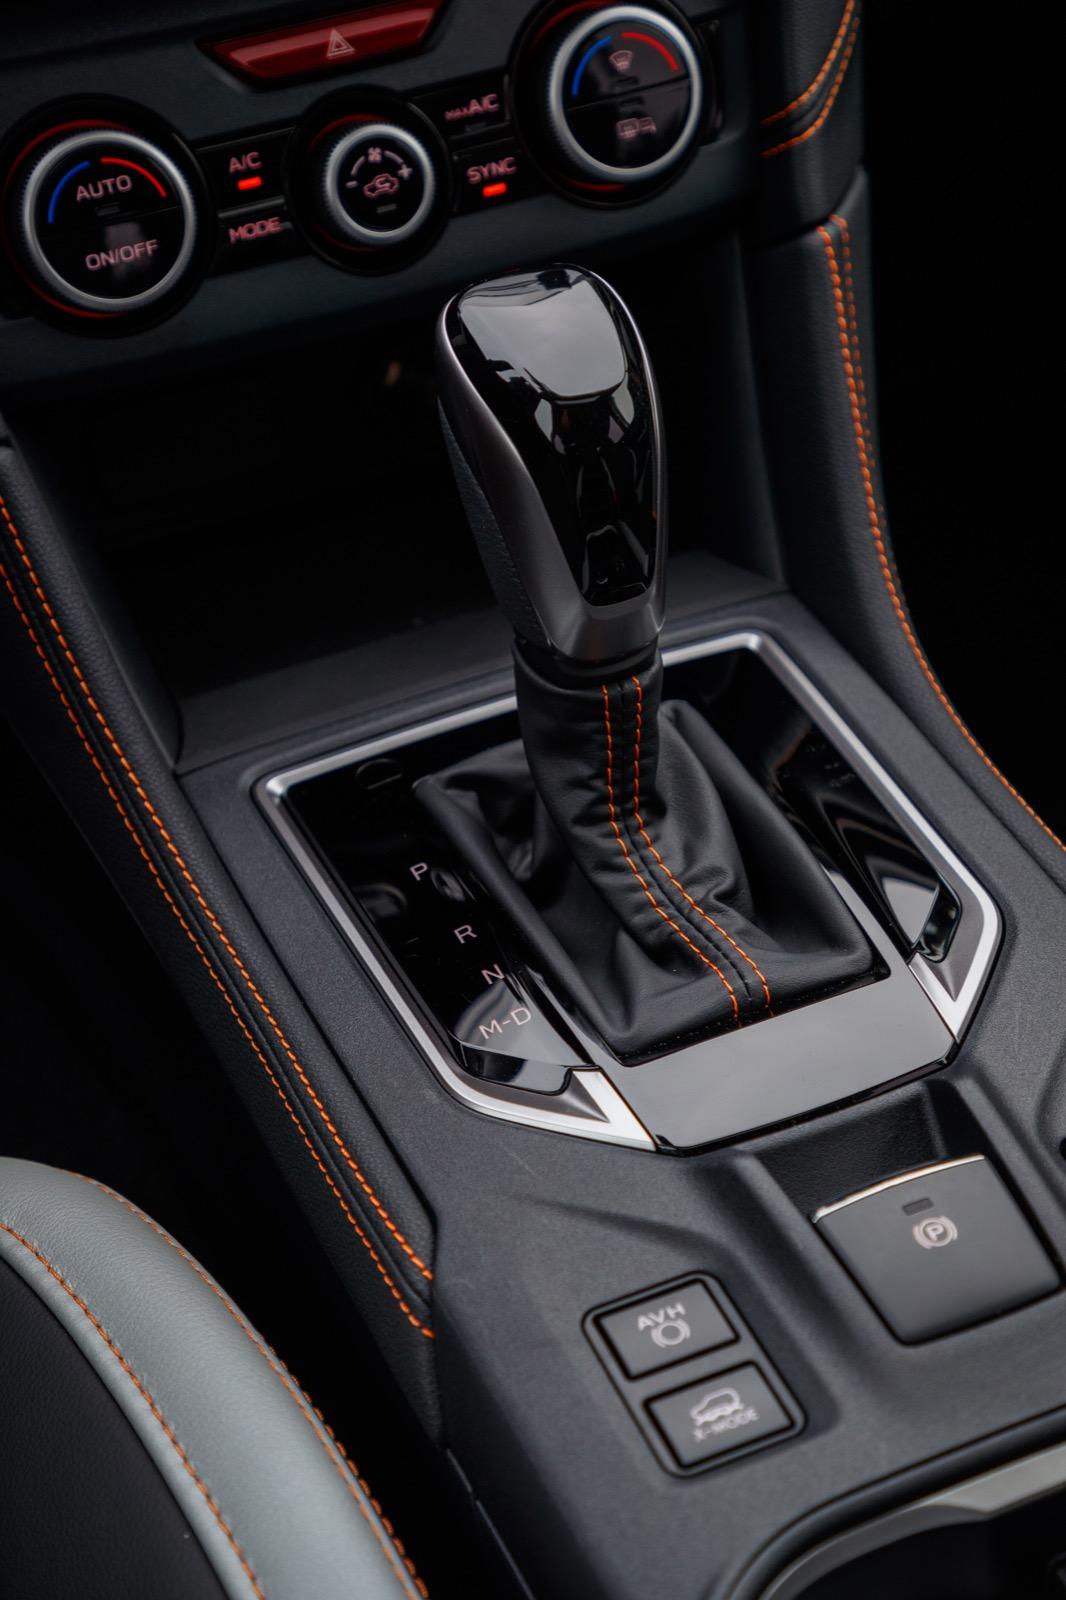 Subaru Xv Eco Hybrid Interior (7)